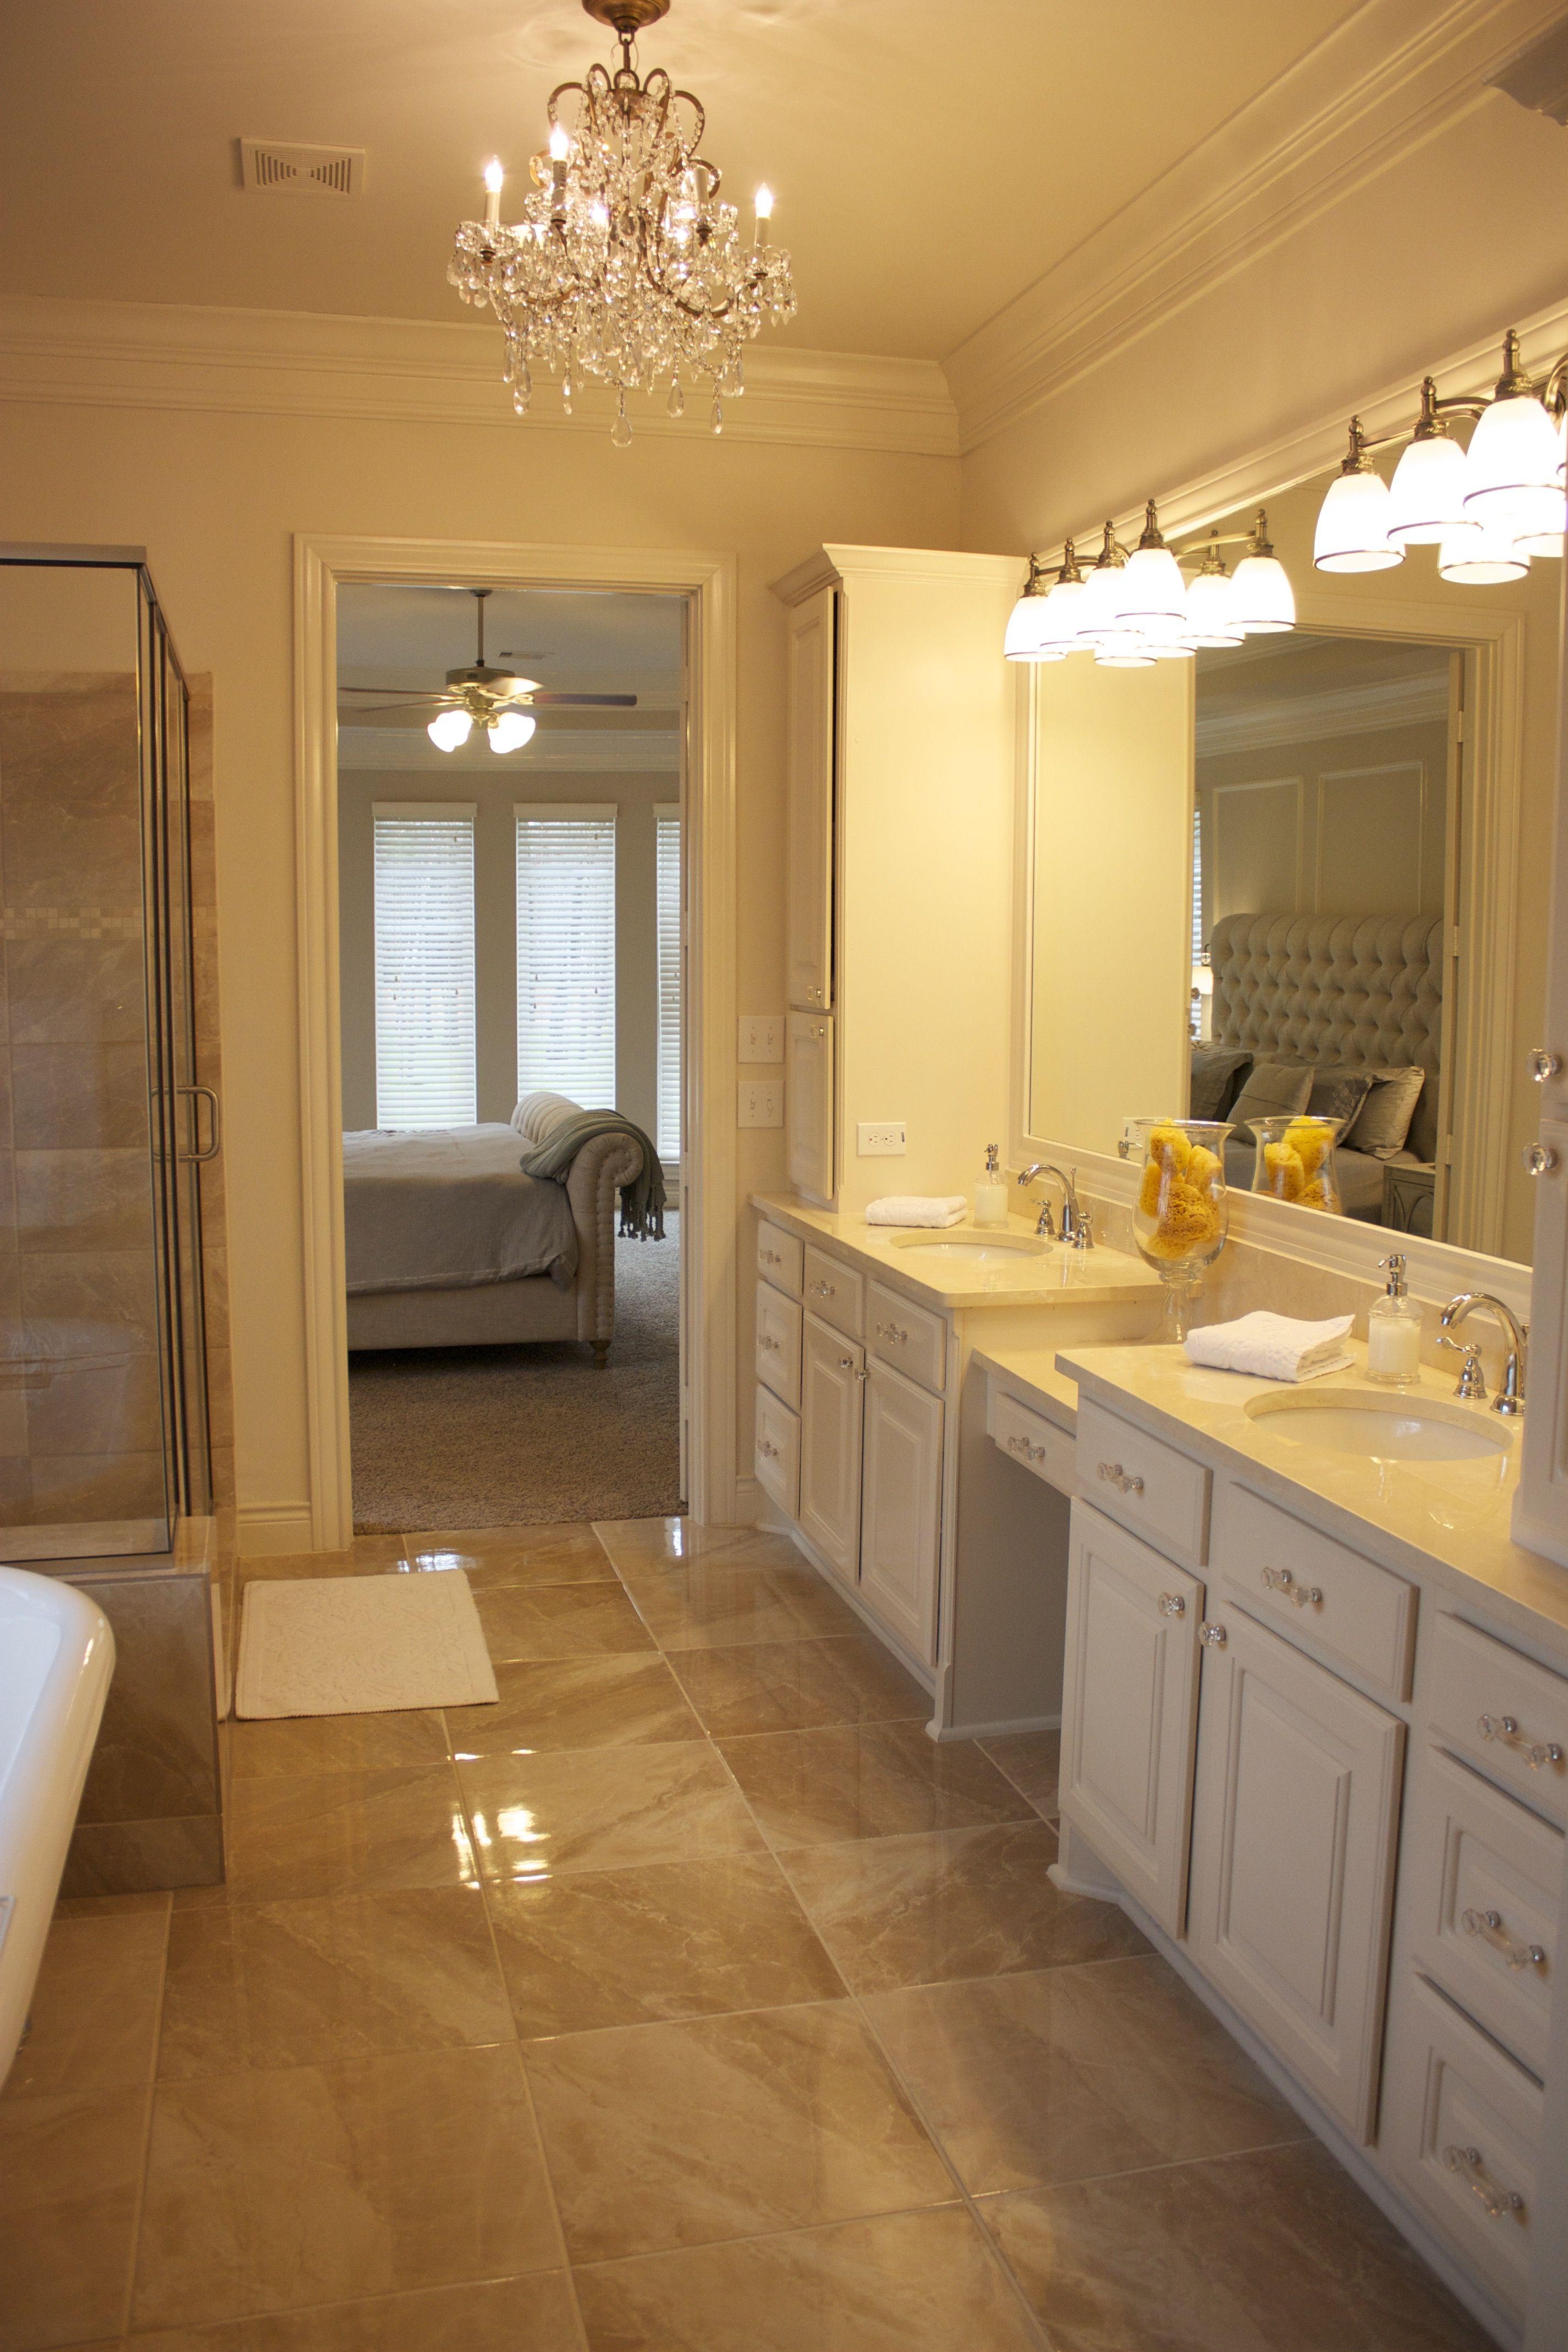 Master bath sherwin williams accessible beige walls off white trim divine white cabinets crema marfil marble countertops restoration hardware